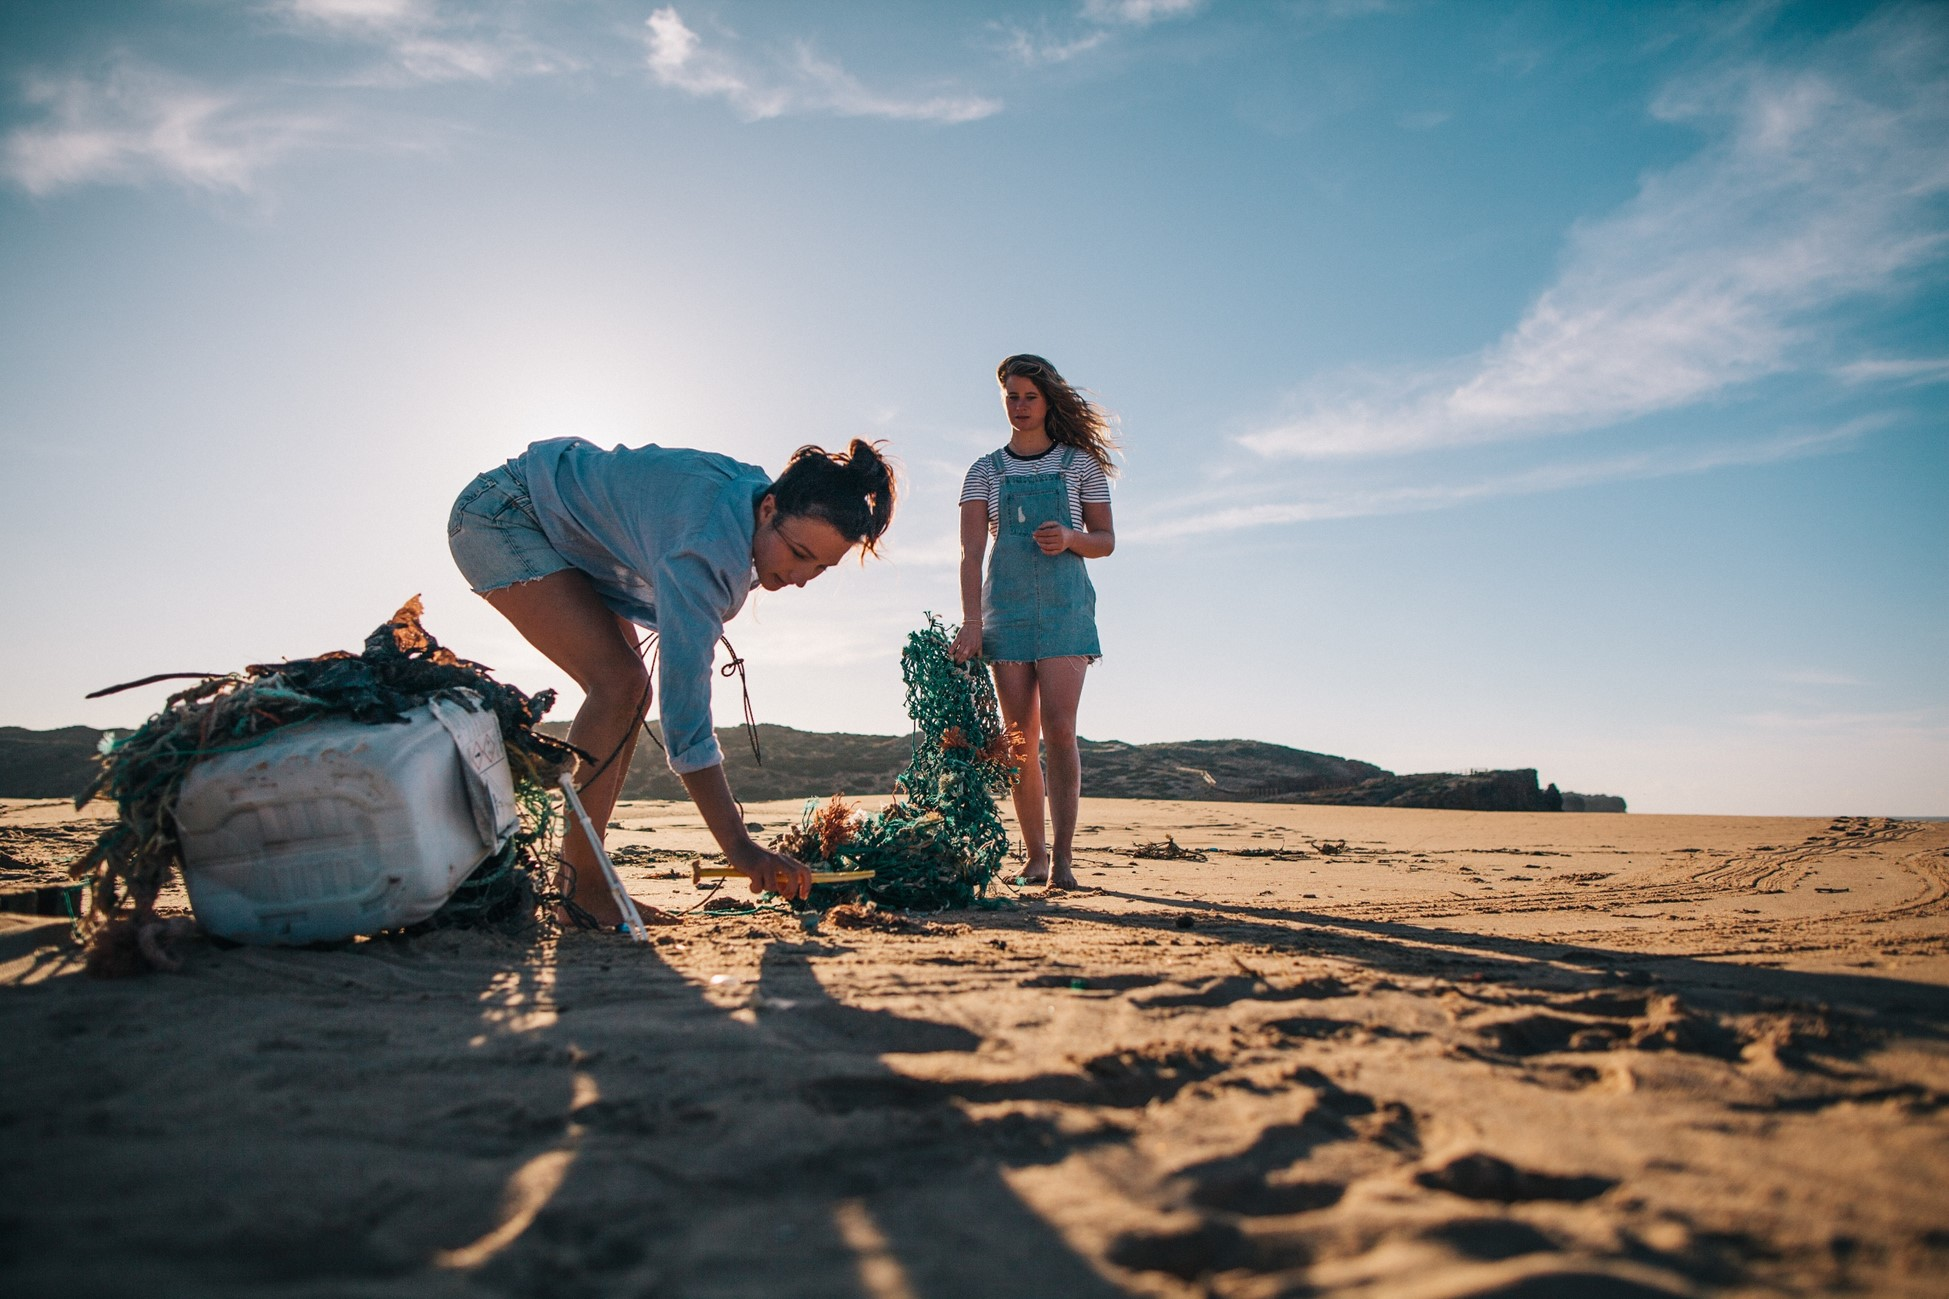 Booking.com、2021年度版「サステイナブル・トラベル」に関する調査結果を発表、環境に配慮したサステイナブルな旅行への需要が高まる